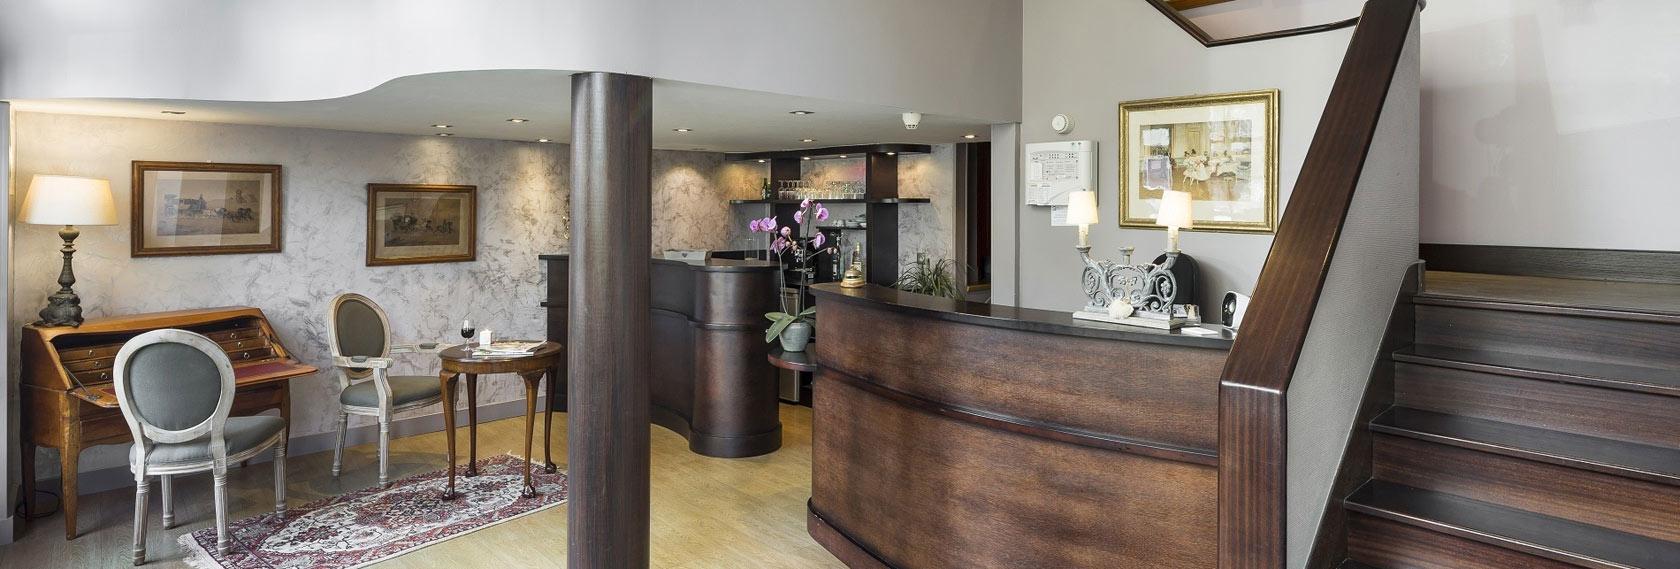 hccb-hotel-charme-maison-vauban-saint-malo-hall